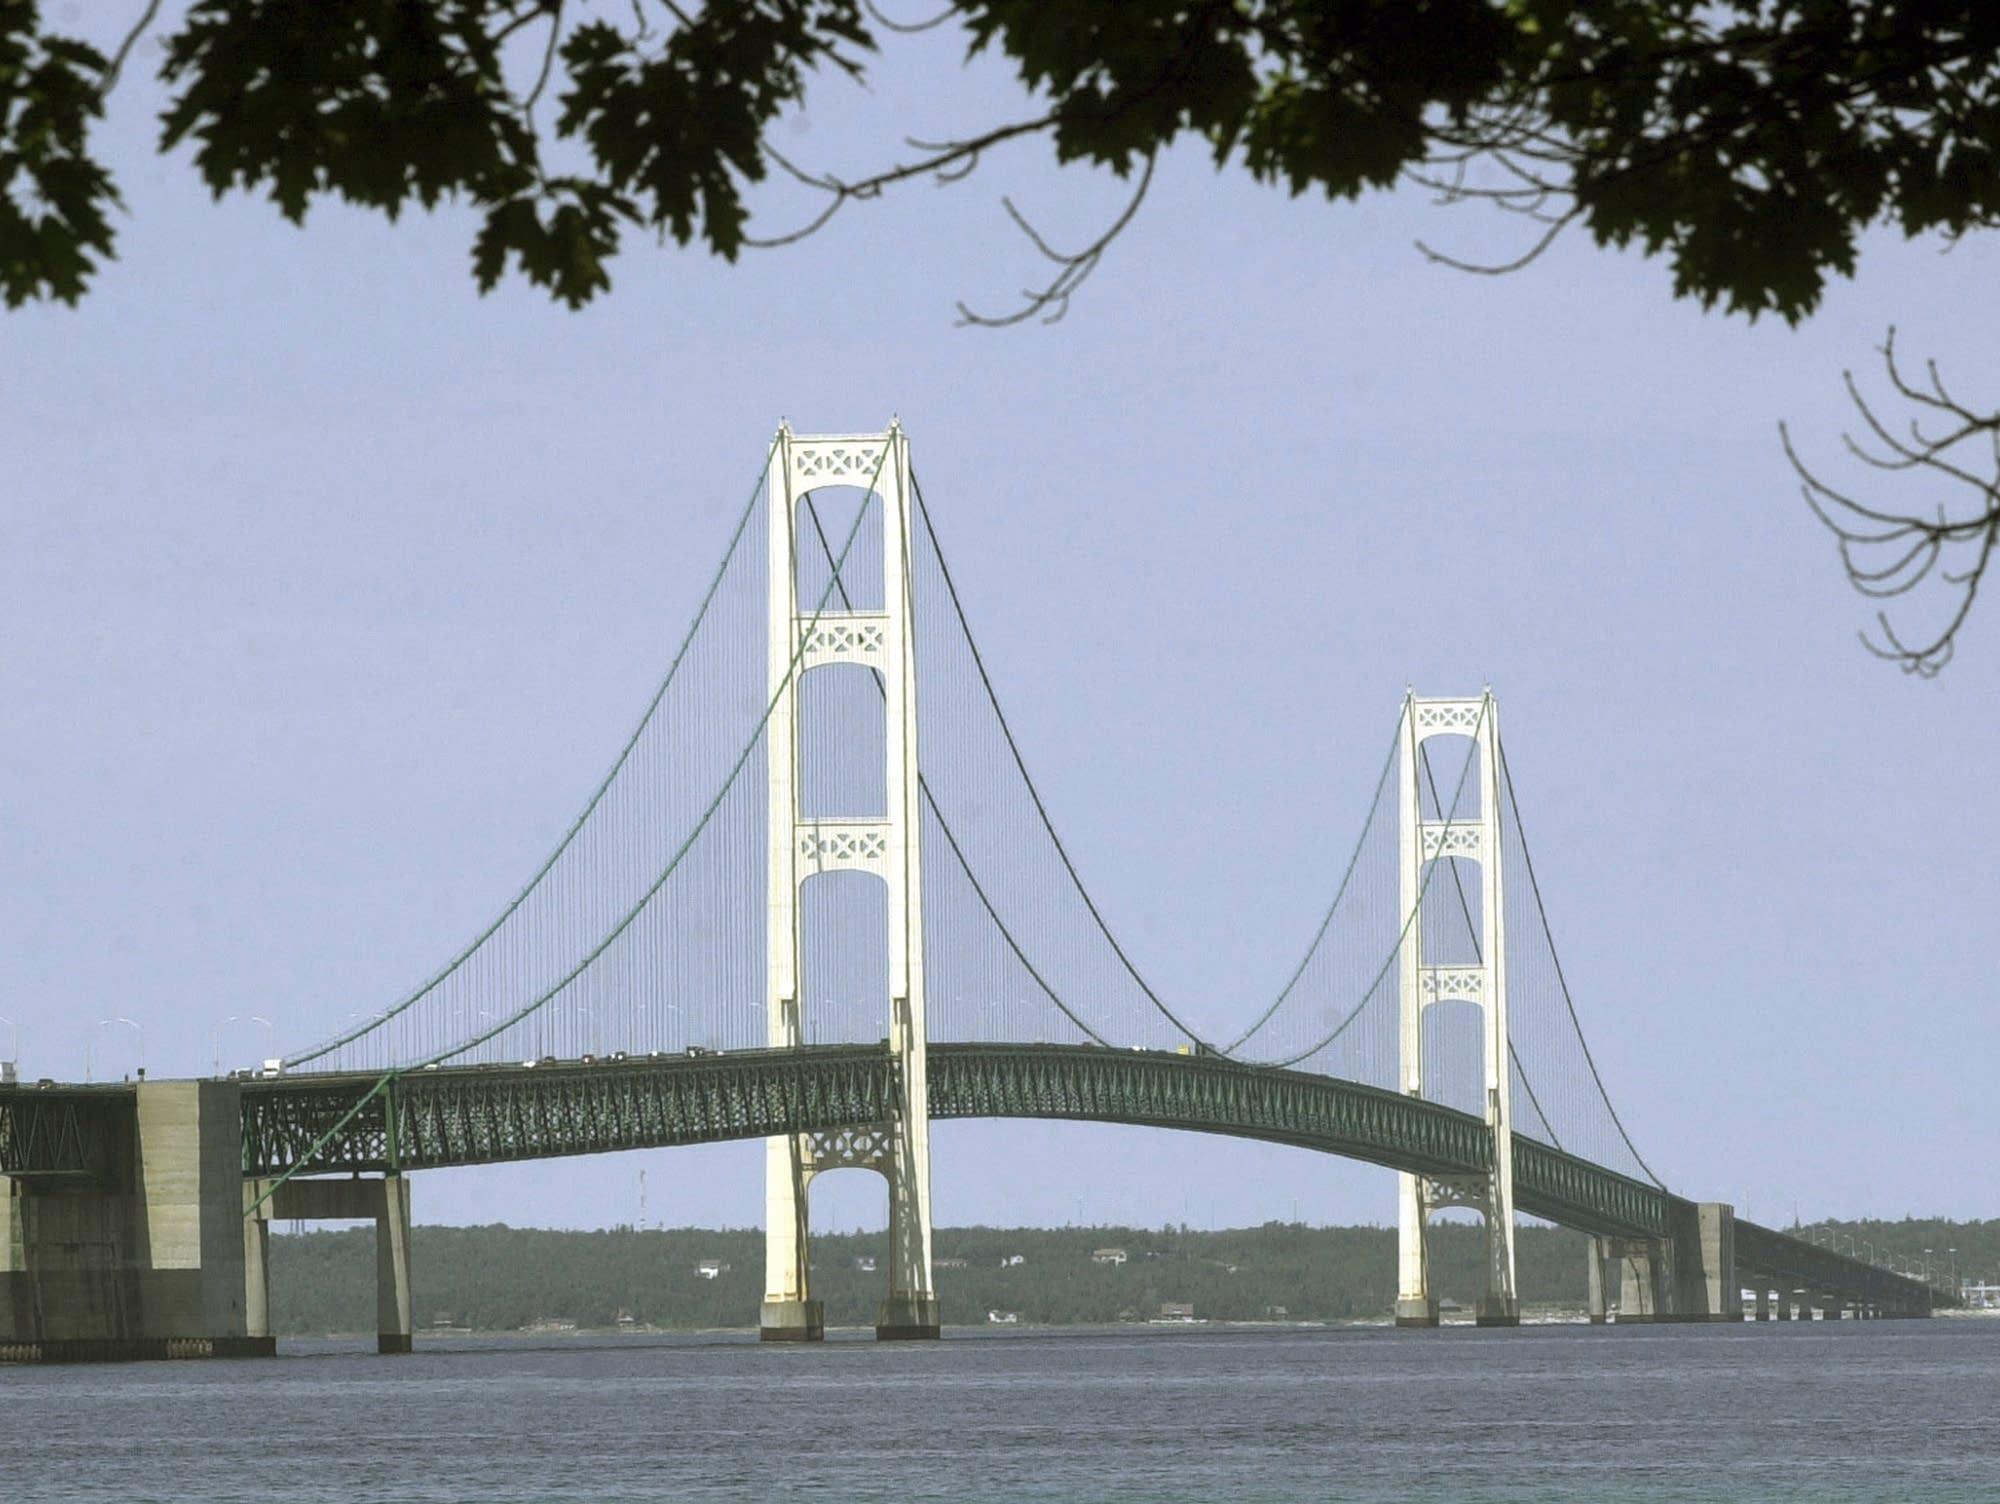 The Mackinac Bridge spans the Straits of Mackinac